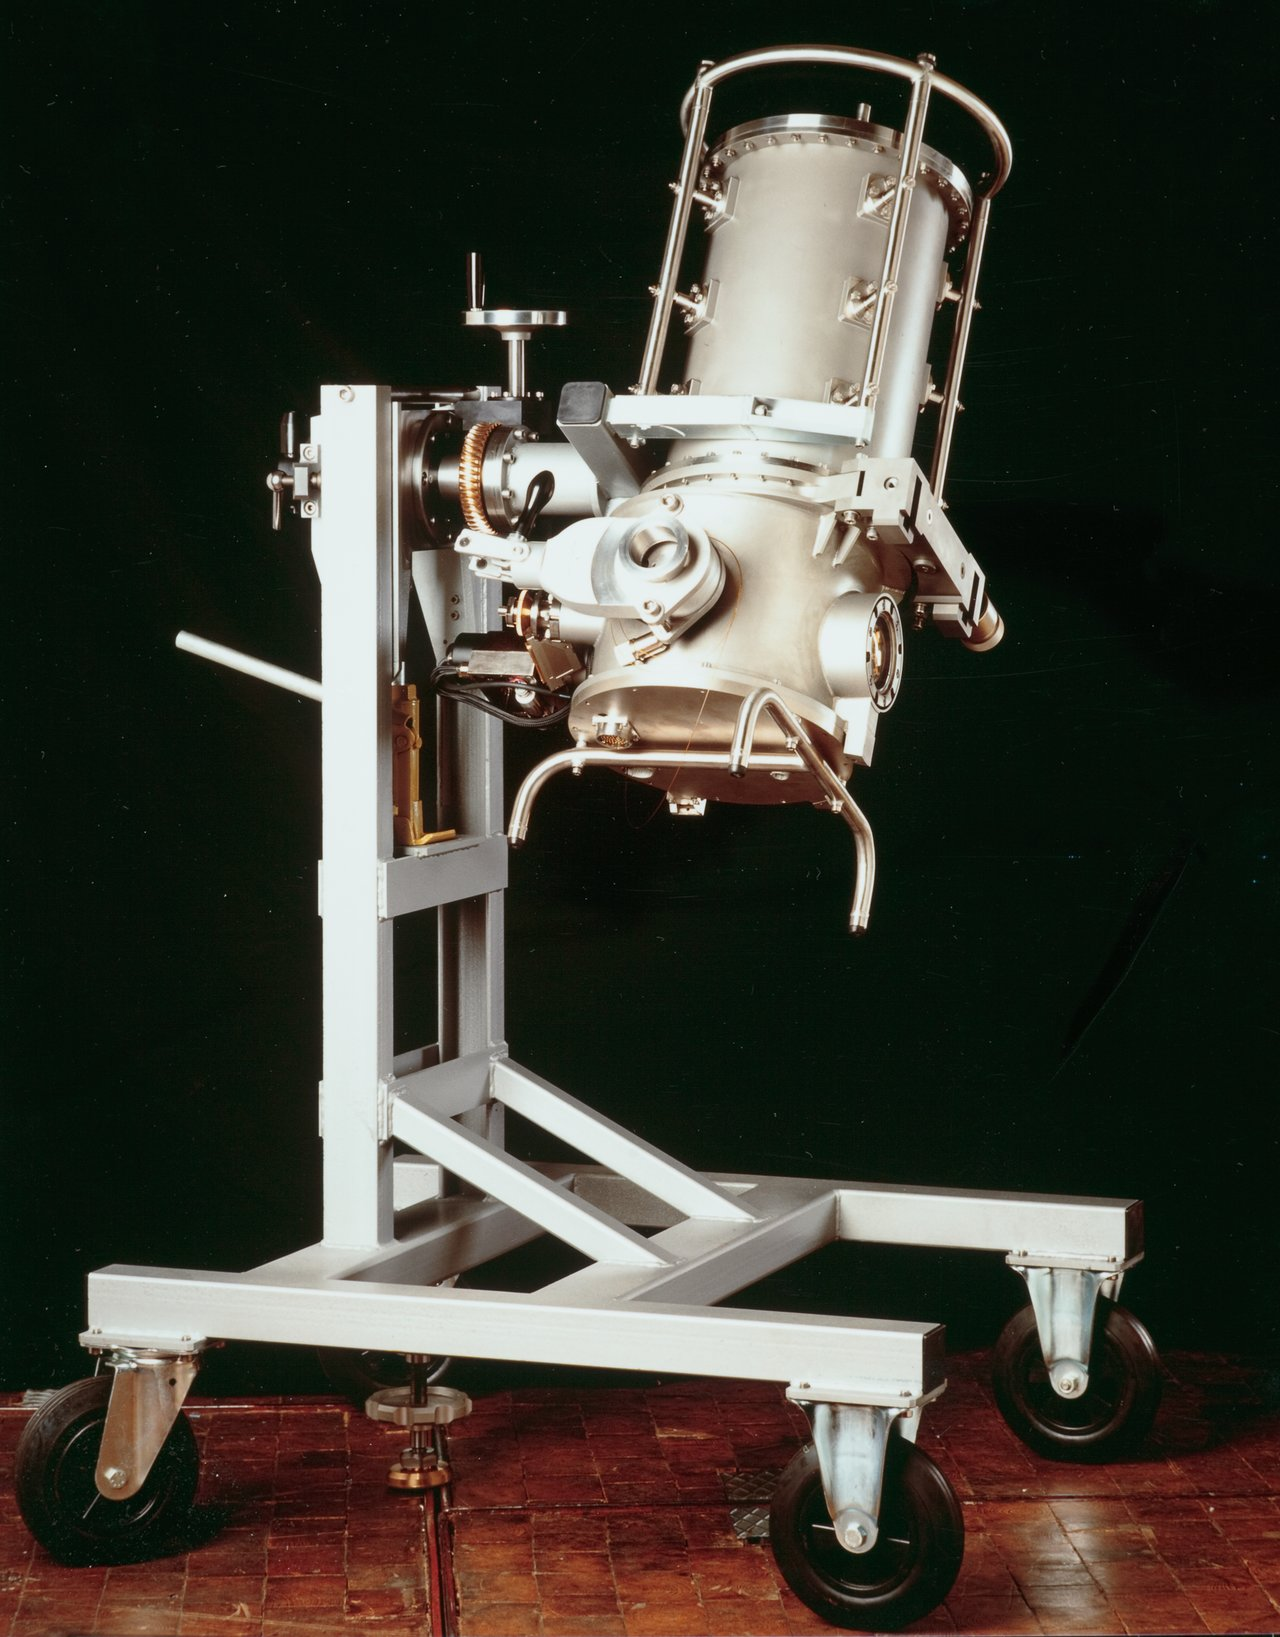 Decommissioned IR instrument